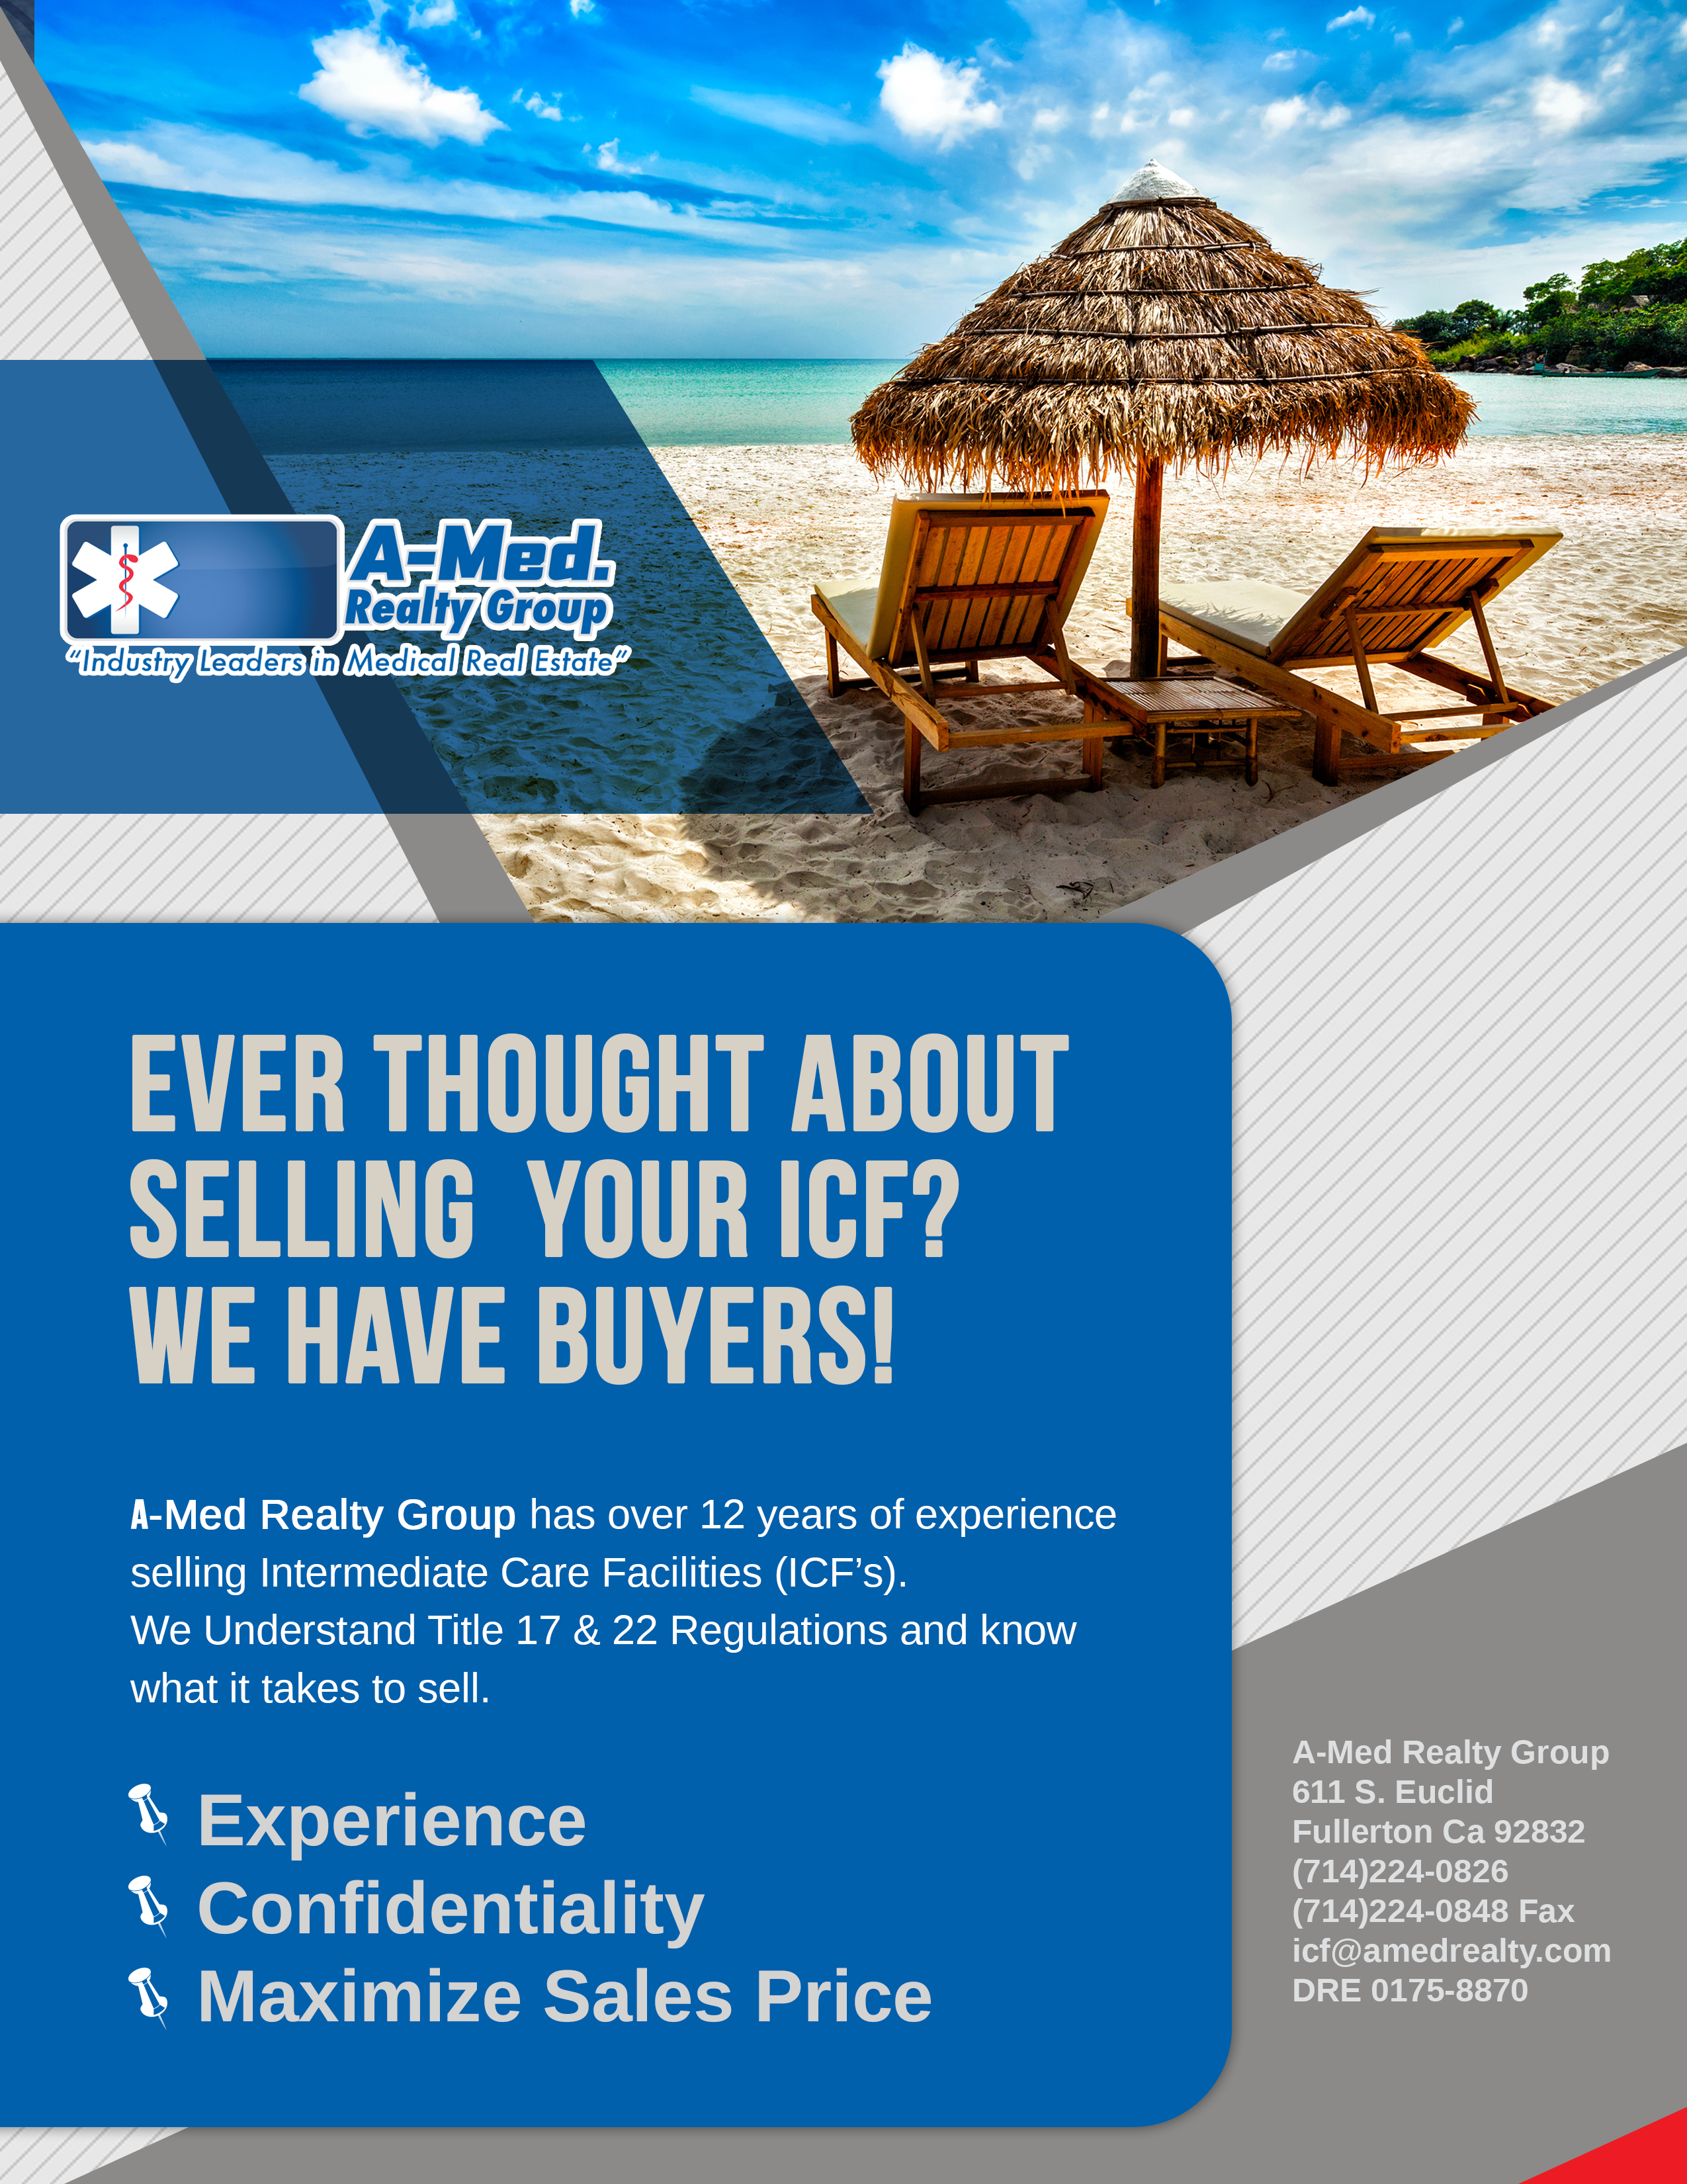 Commercial Realty Flyer Design